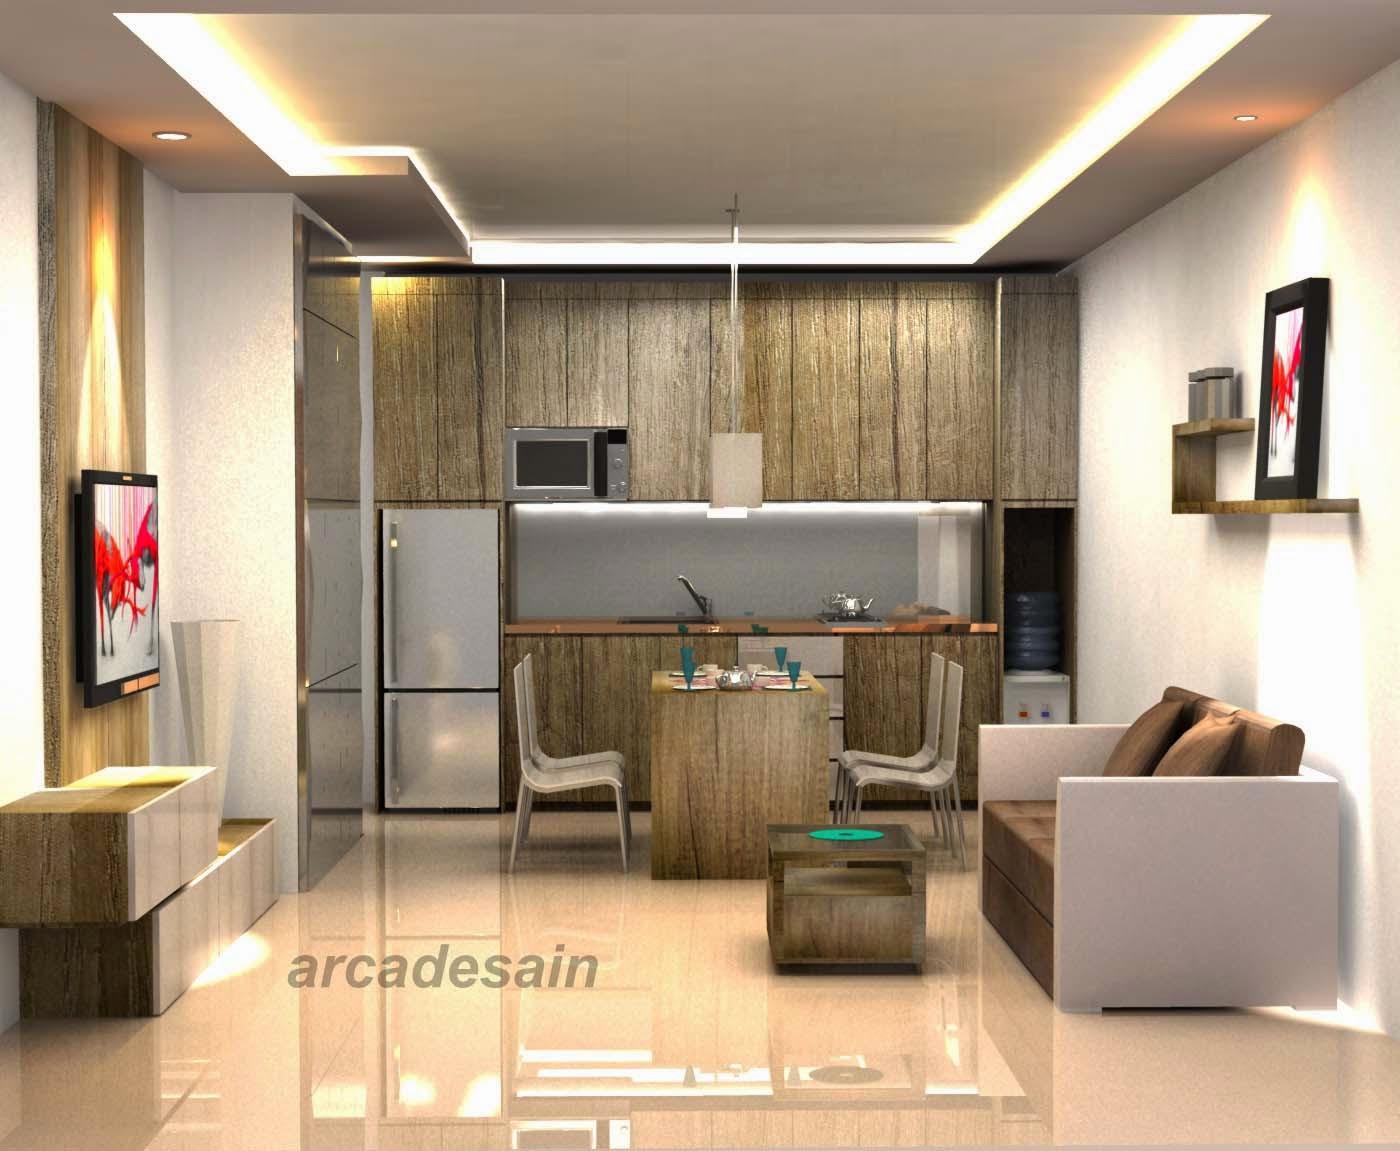 Arcadesain desain interior apartemen green palace type for Desain apartemen studio 21m